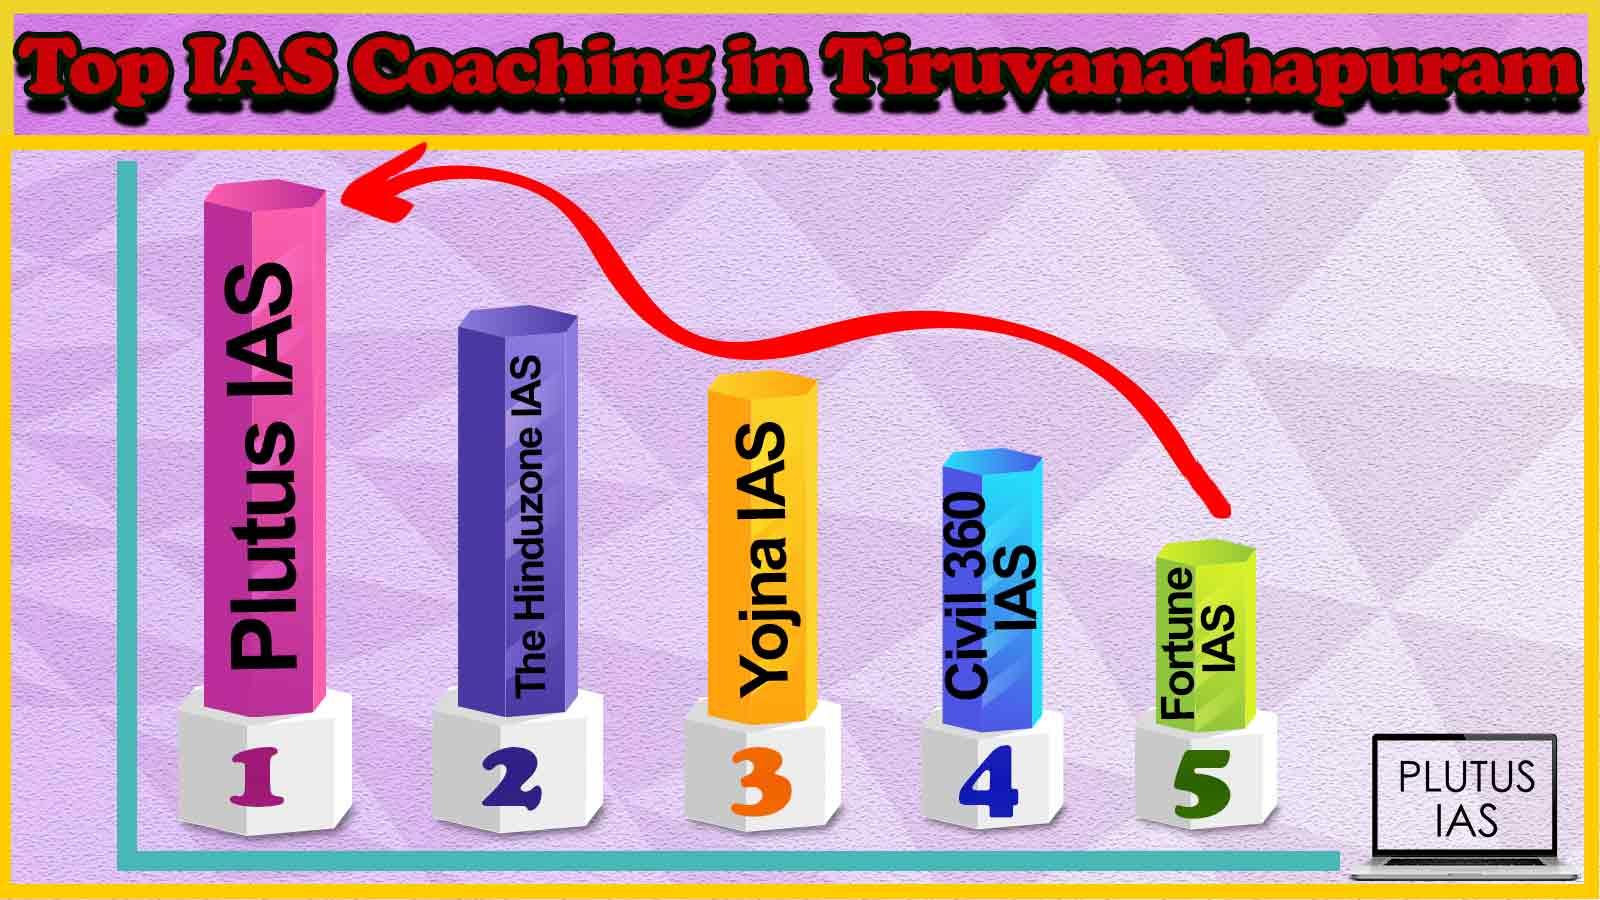 Top 10 IAS Coaching in Thiruvananthapuram